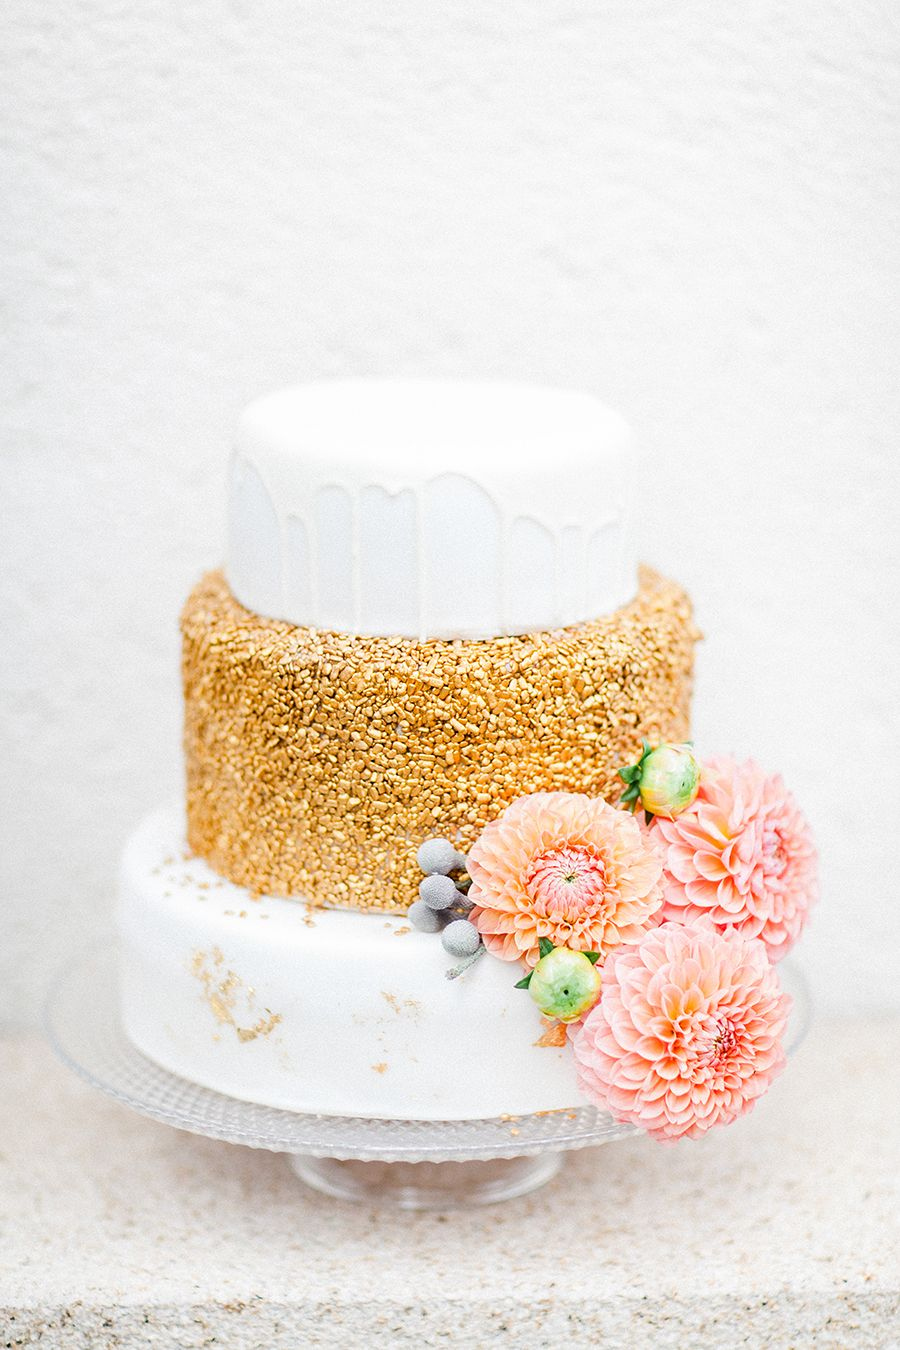 Hochzeitsideen In Koralle Cakes Sweets Pinterest